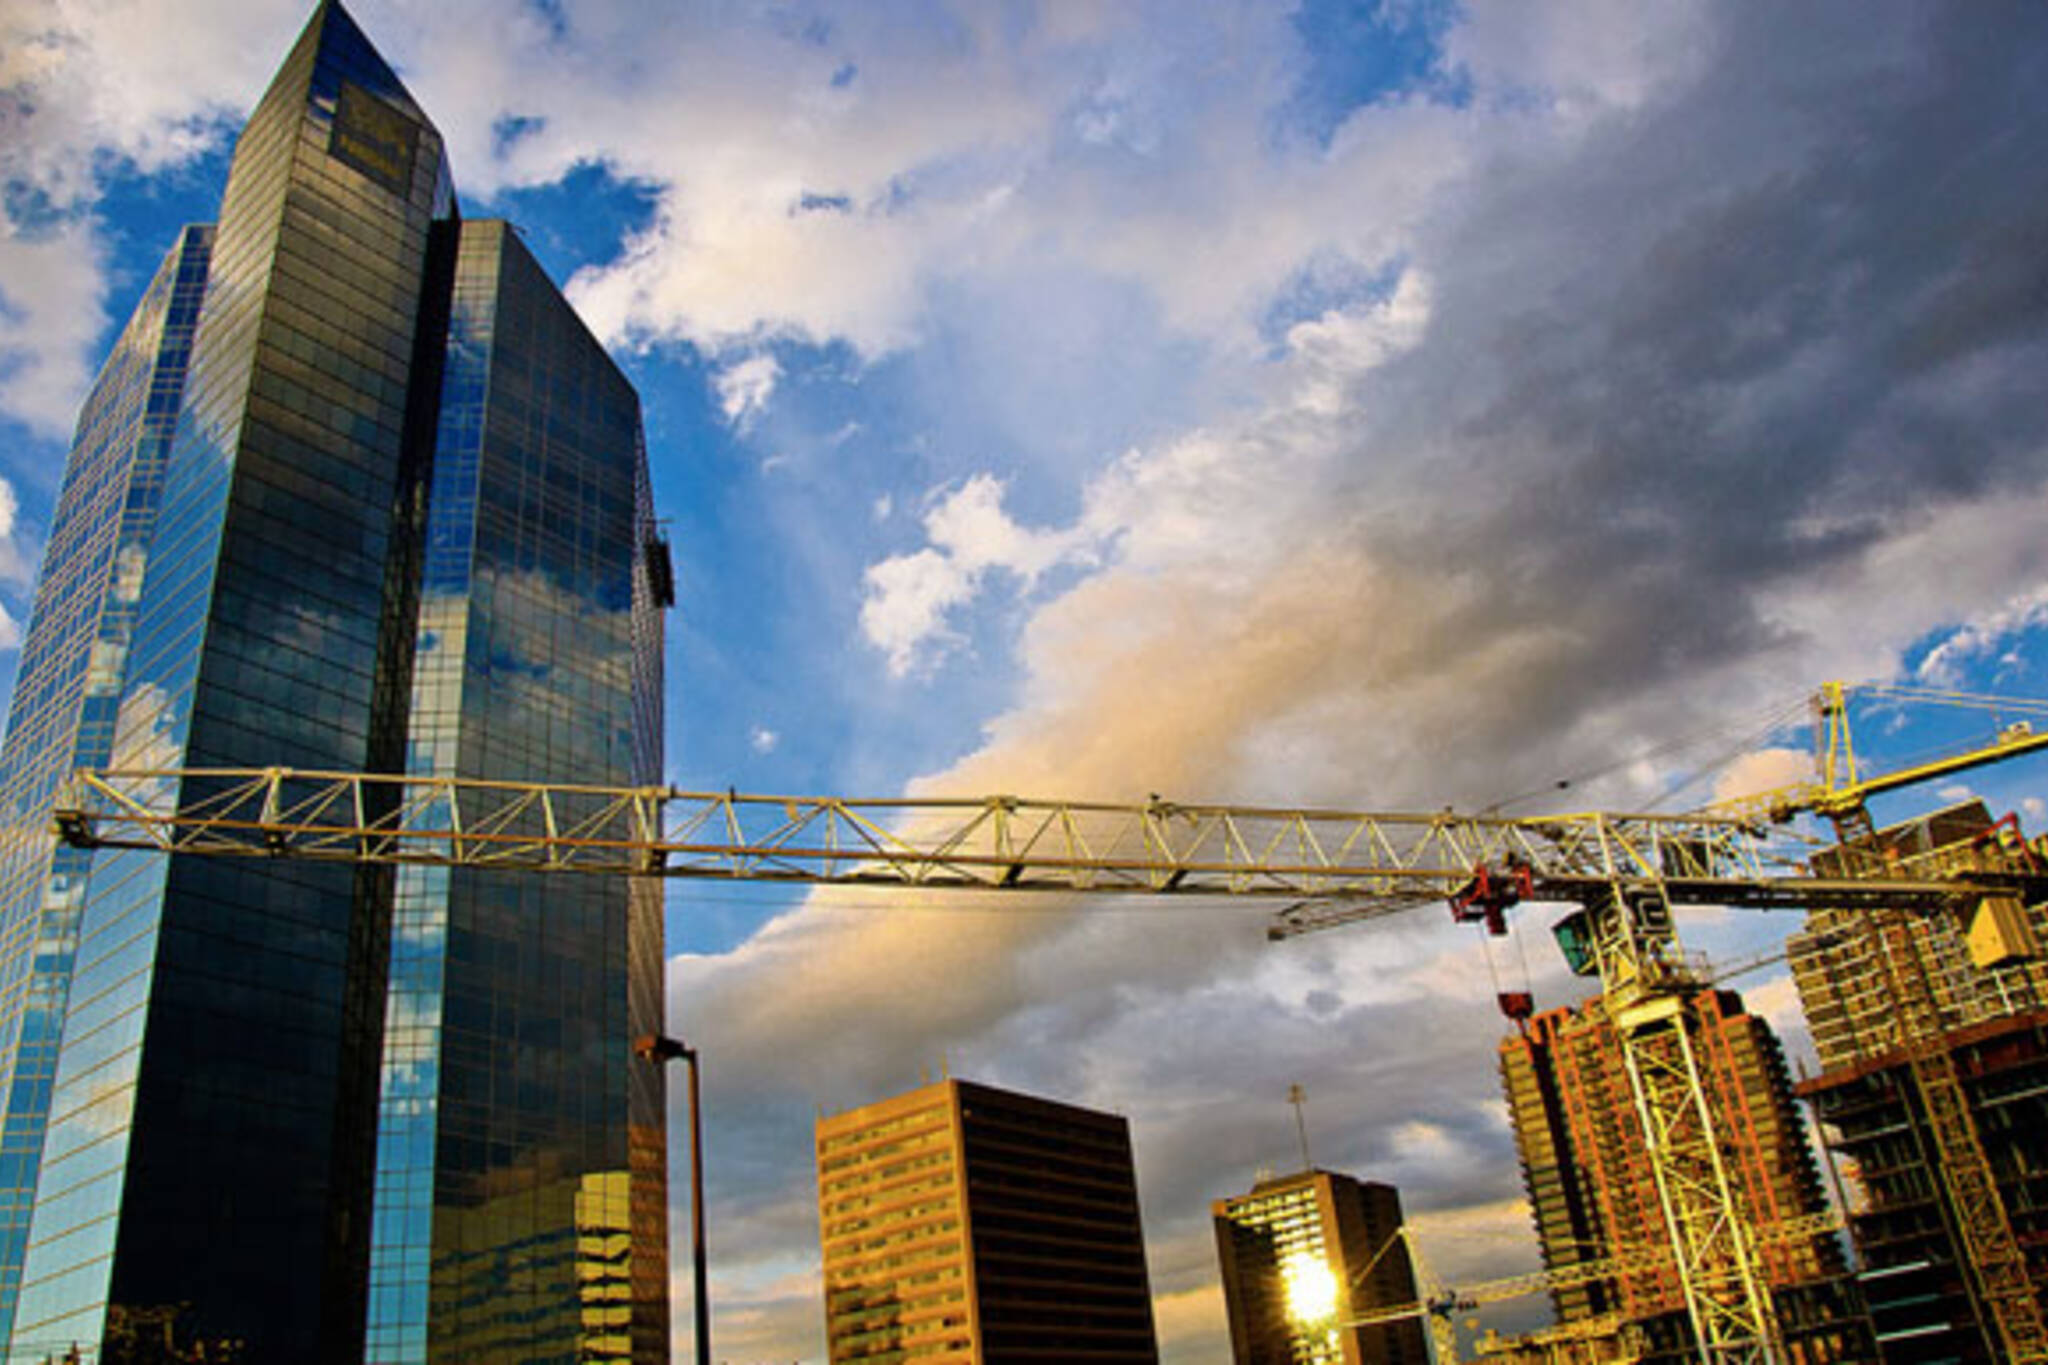 toronto construction cranes skyline buildings